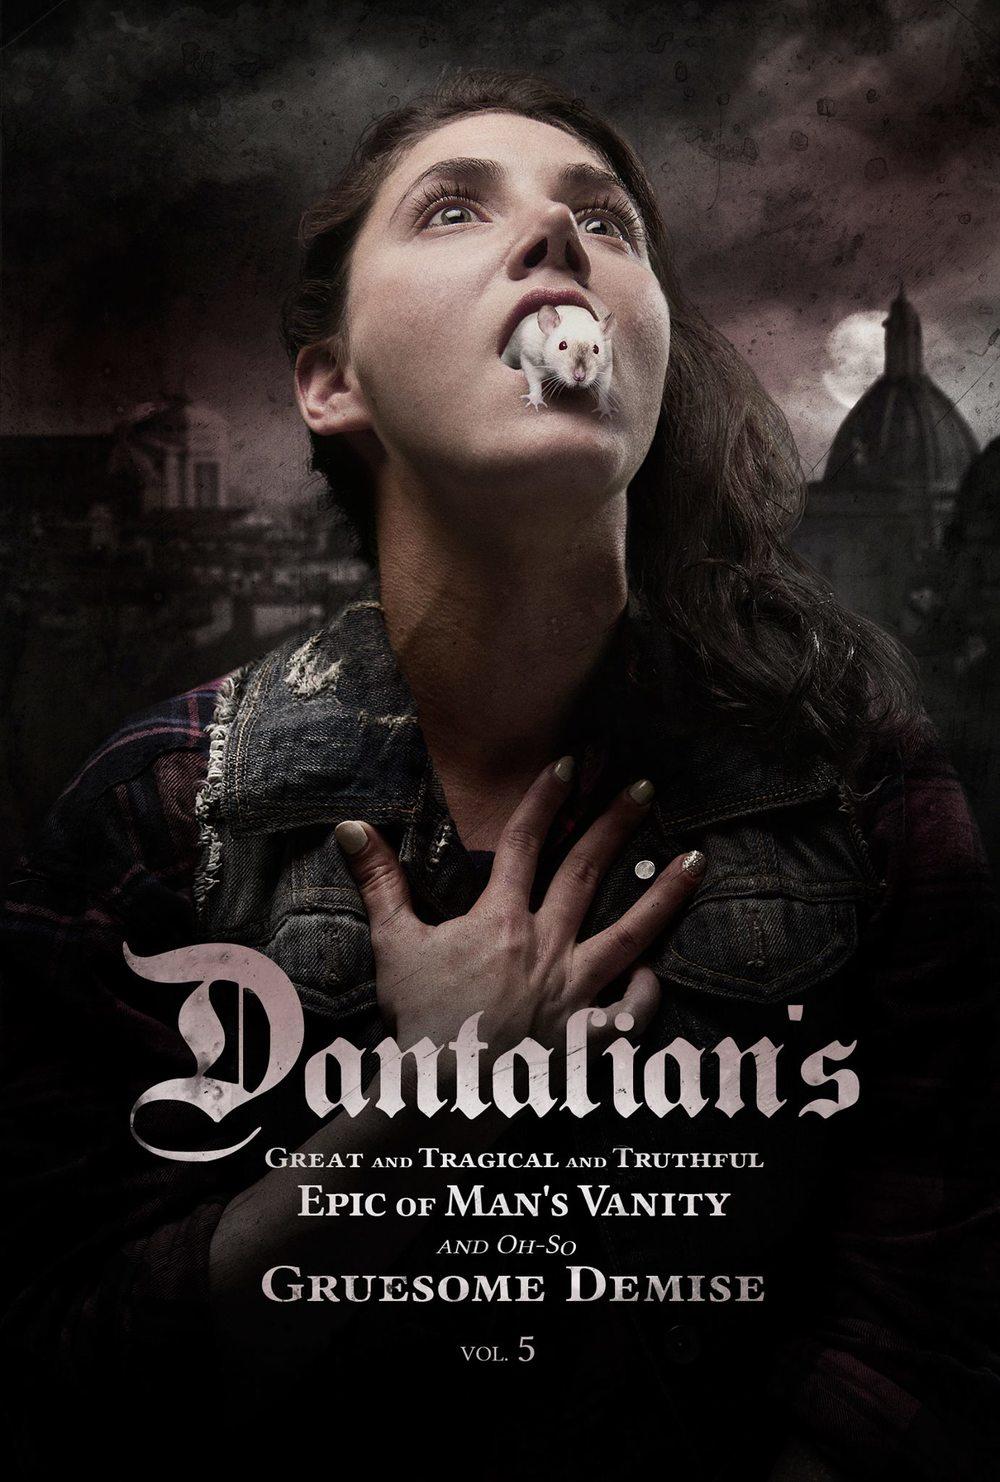 Dantalian poster.jpg